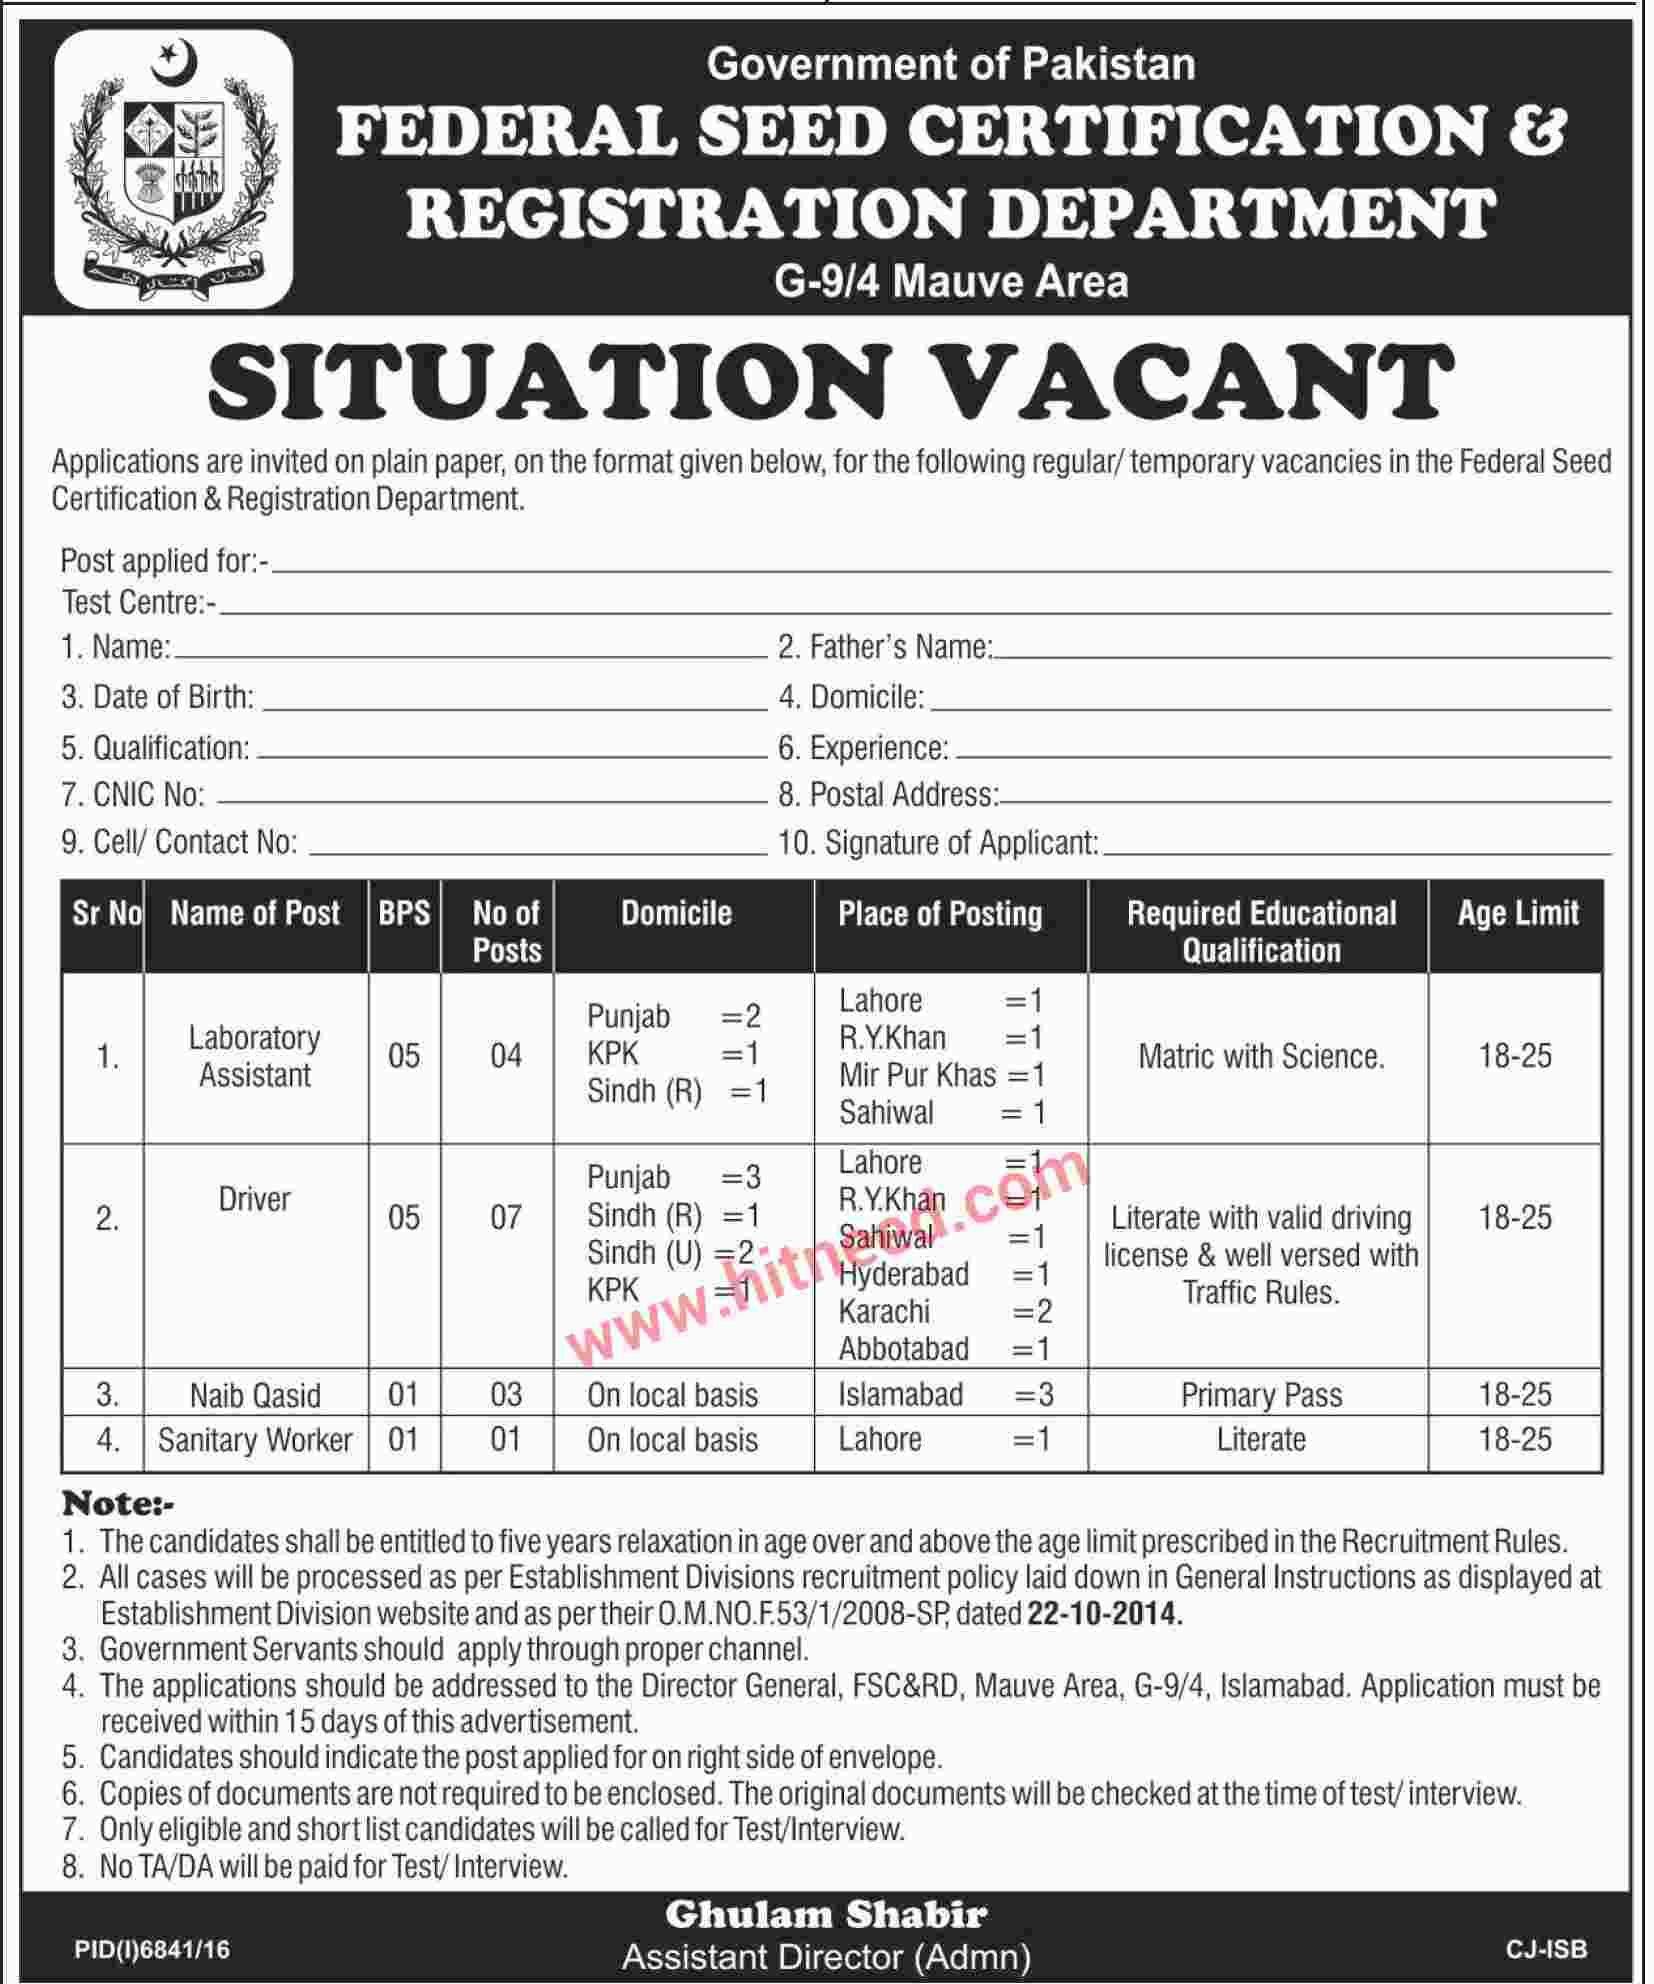 Federal Seed Certification & Registration Department, Laboratory Assistant Jobs, Jun 2017 Last Date: 03-07-2017   #Driver #Govt. Jobs #Laboratory Assistant #Naib Qasid #Sanitary Worker